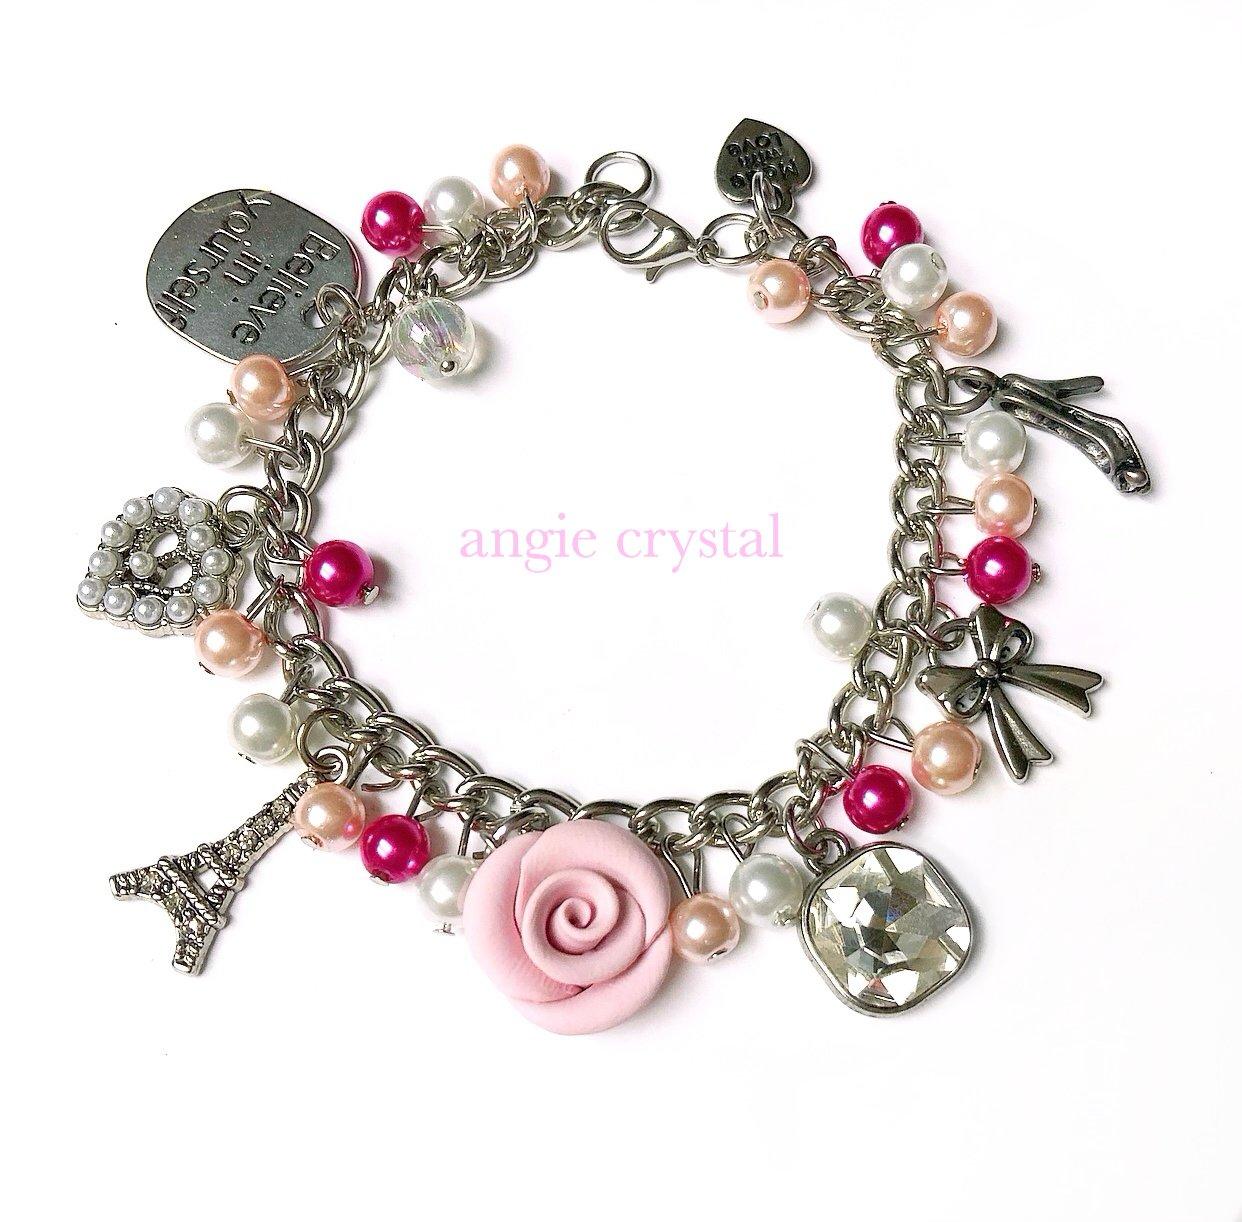 Image of Girly Pink Charm Bracelet